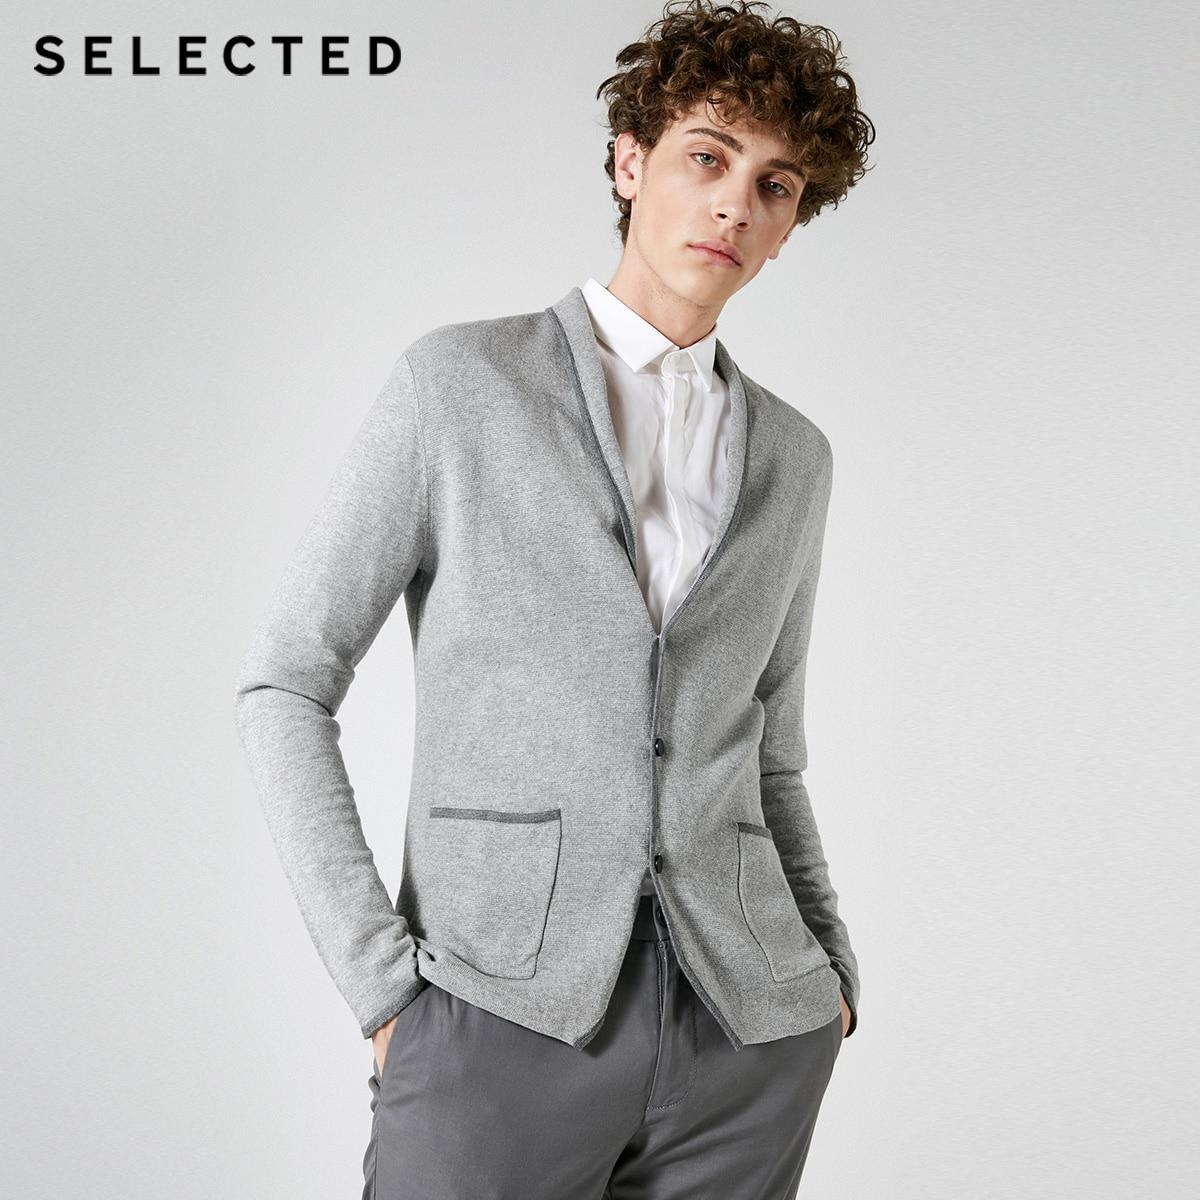 SELECTED Sweater Men Cardigan Autumn Men's Long-Sleeved Wool-Blend Casaco No Masculino